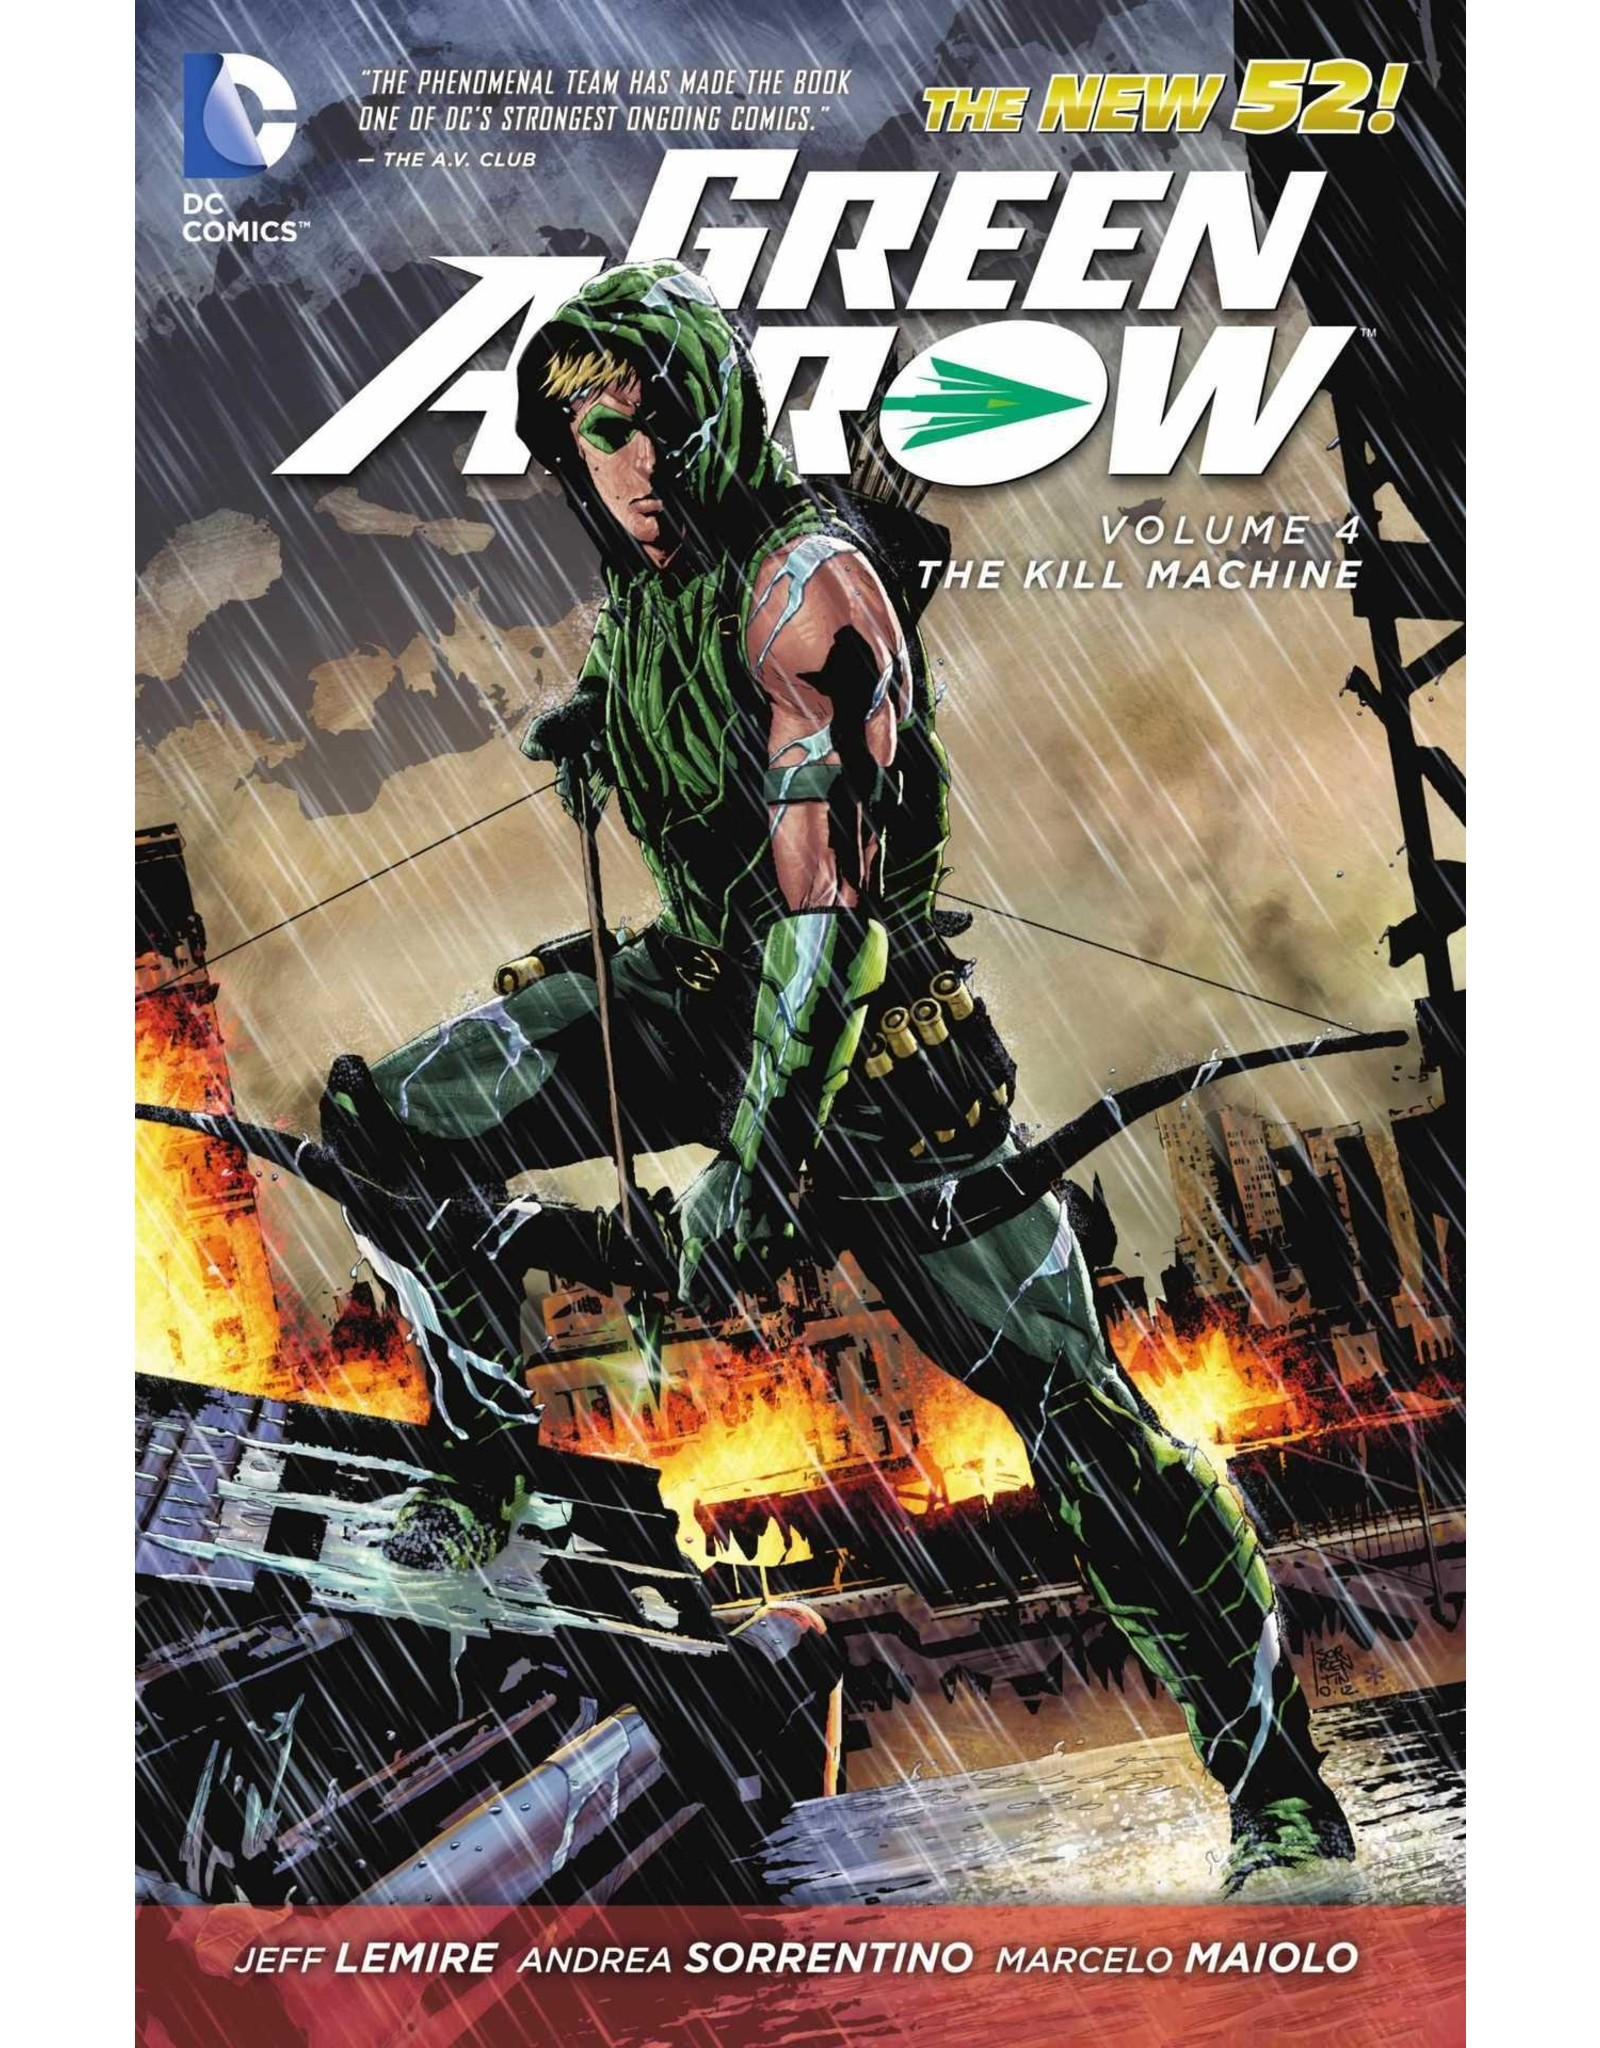 DC COMICS GREEN ARROW TP VOL 04 THE KILL MACHINE